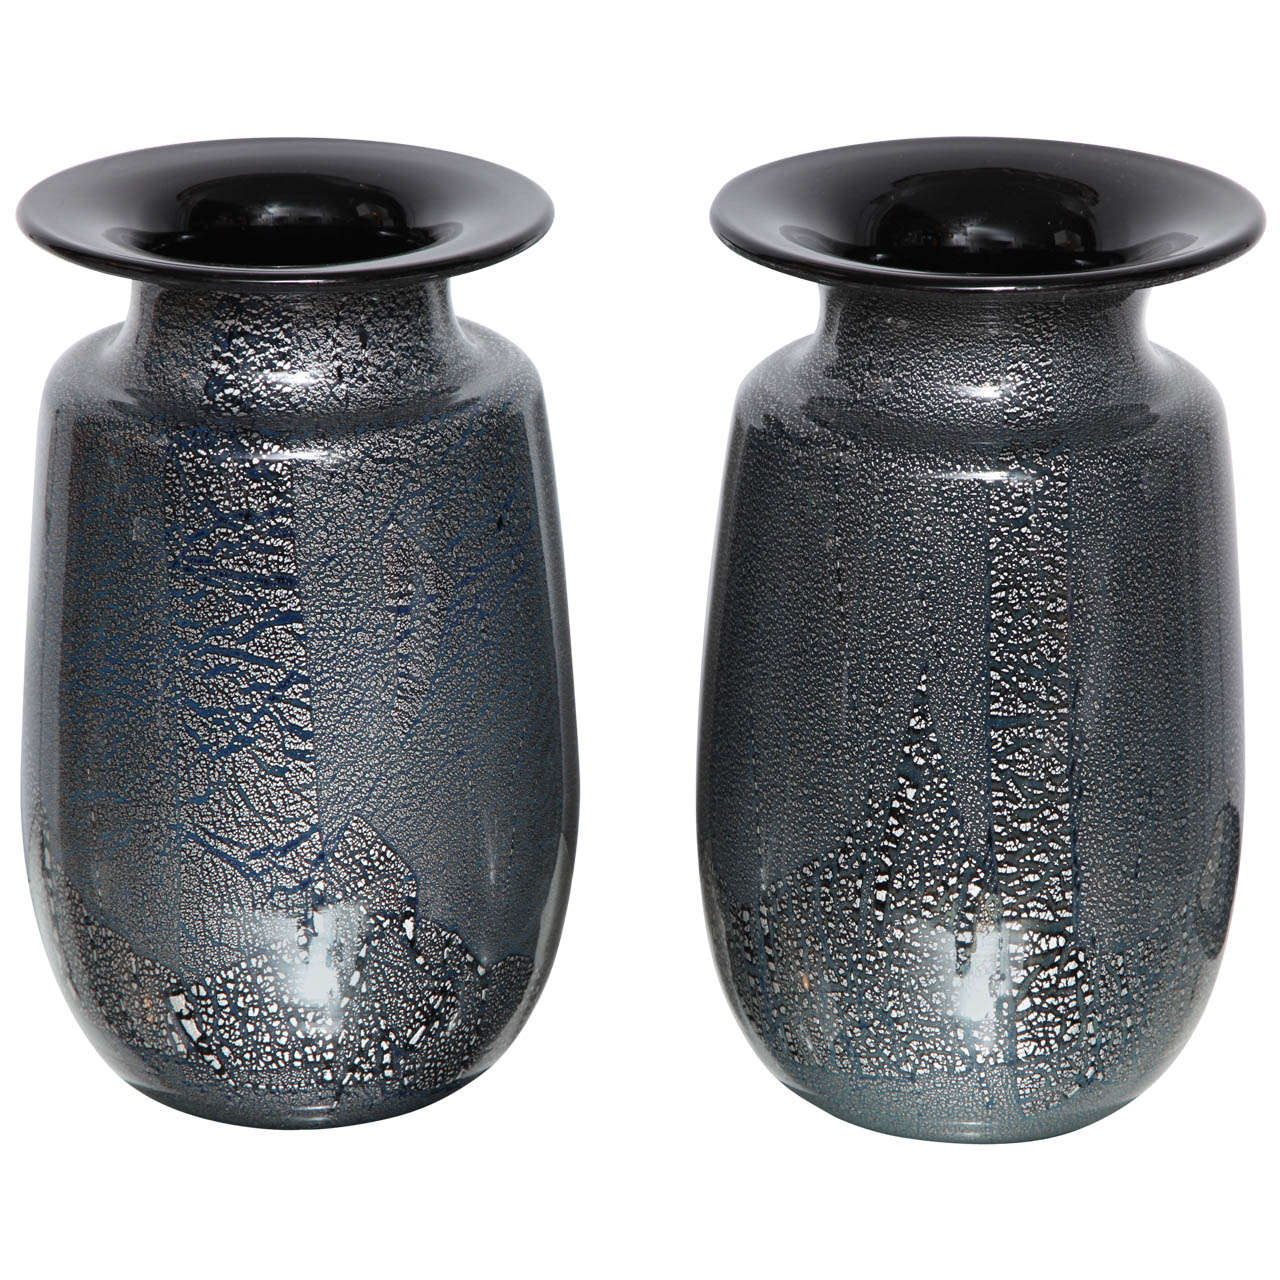 Seguso vetri darte siver leaf black glass vases at 1stdibs seguso vetri darte siver leaf black glass vases for sale reviewsmspy